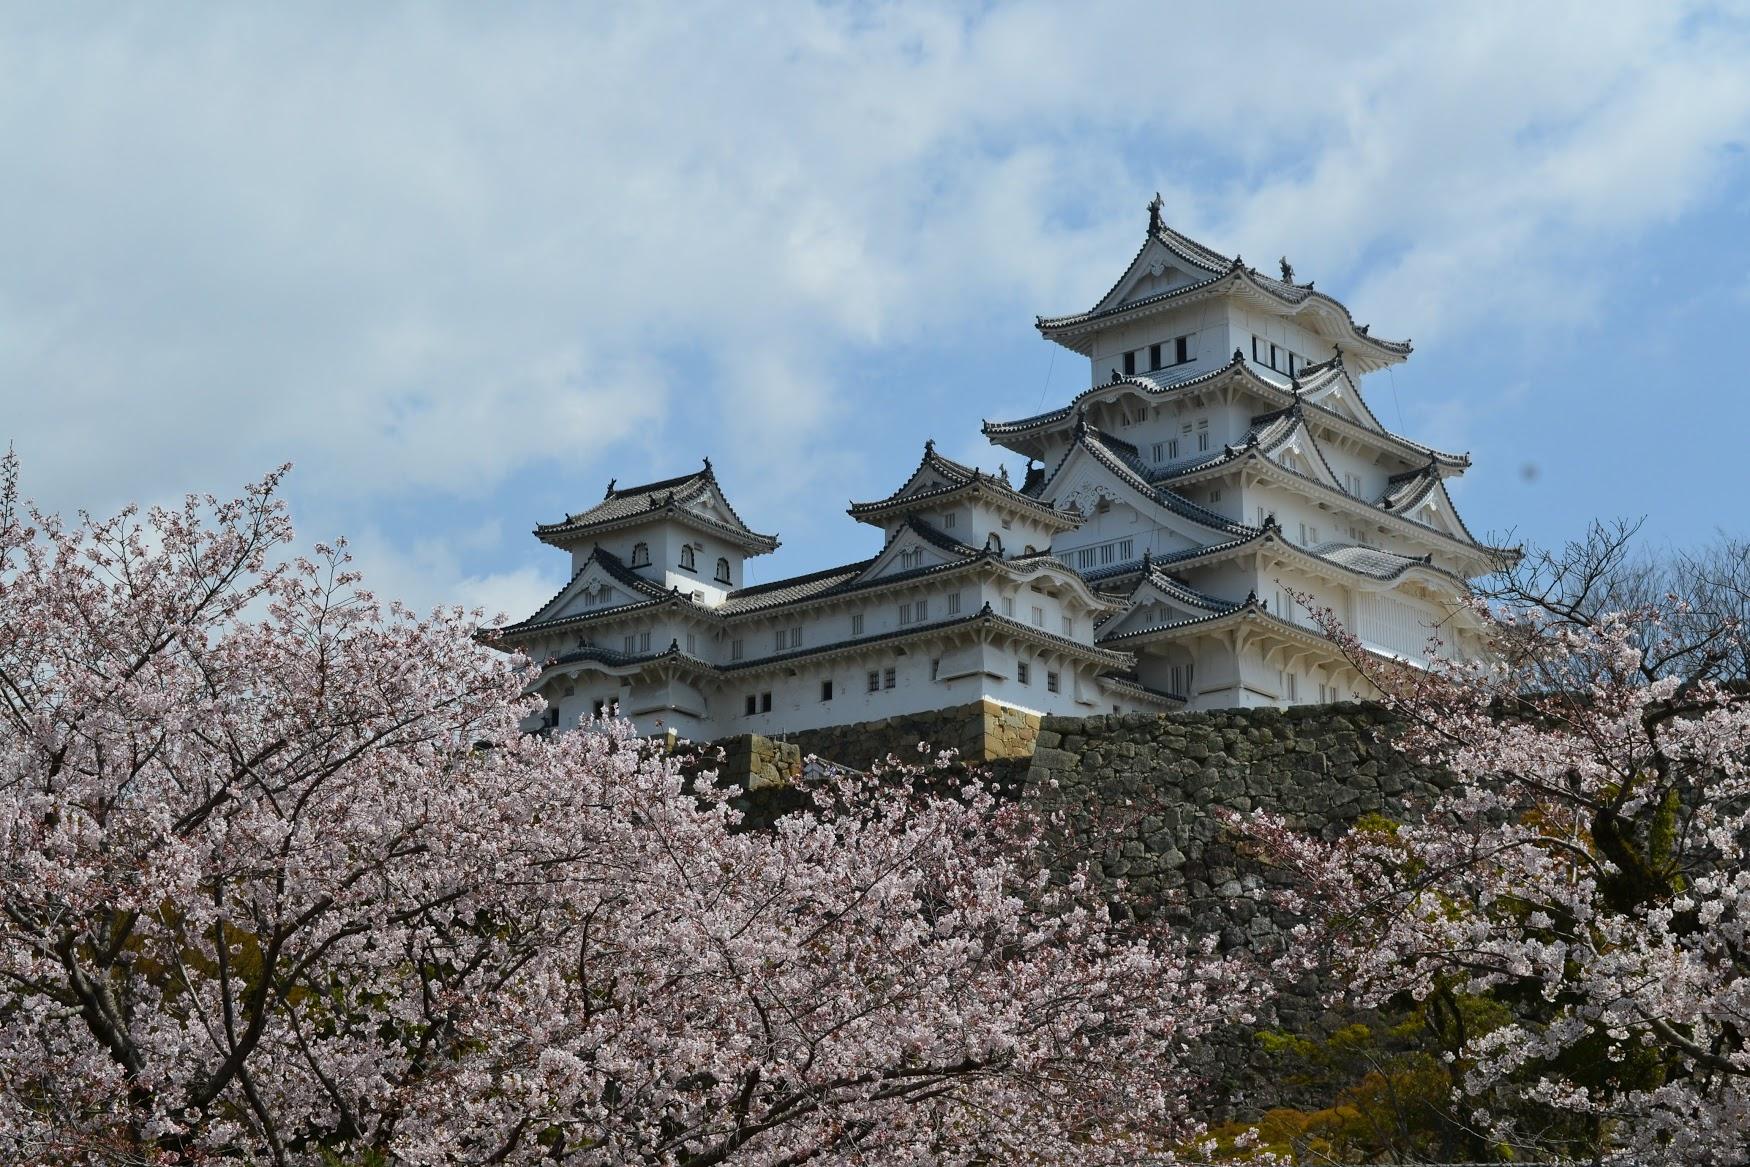 Himeji Castle in Himeji, close to cities like Kobe and Osaka.